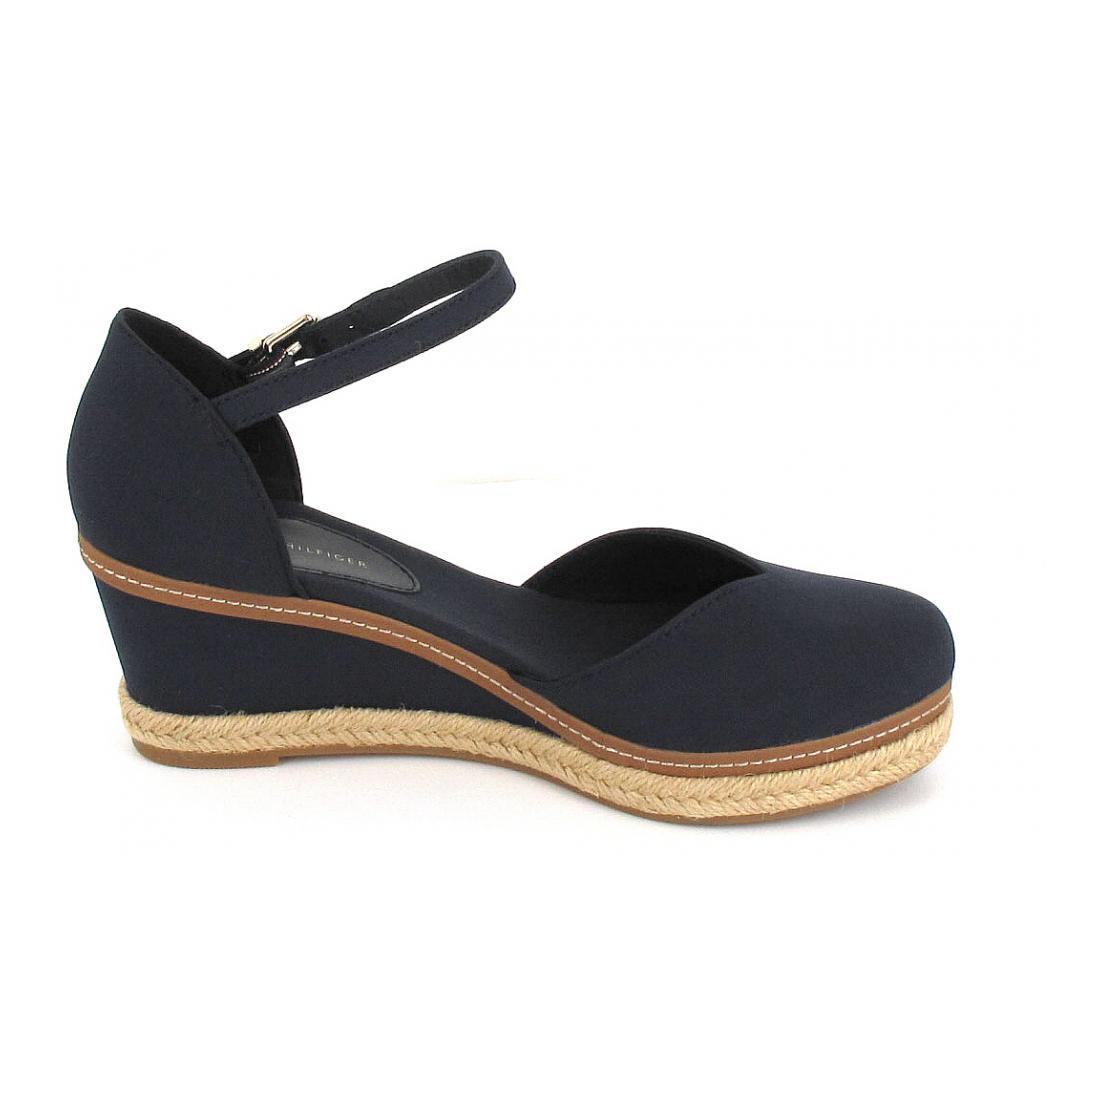 Tommy Hilfiger Sandalette BASIC CLOSED DW5 PP W1A